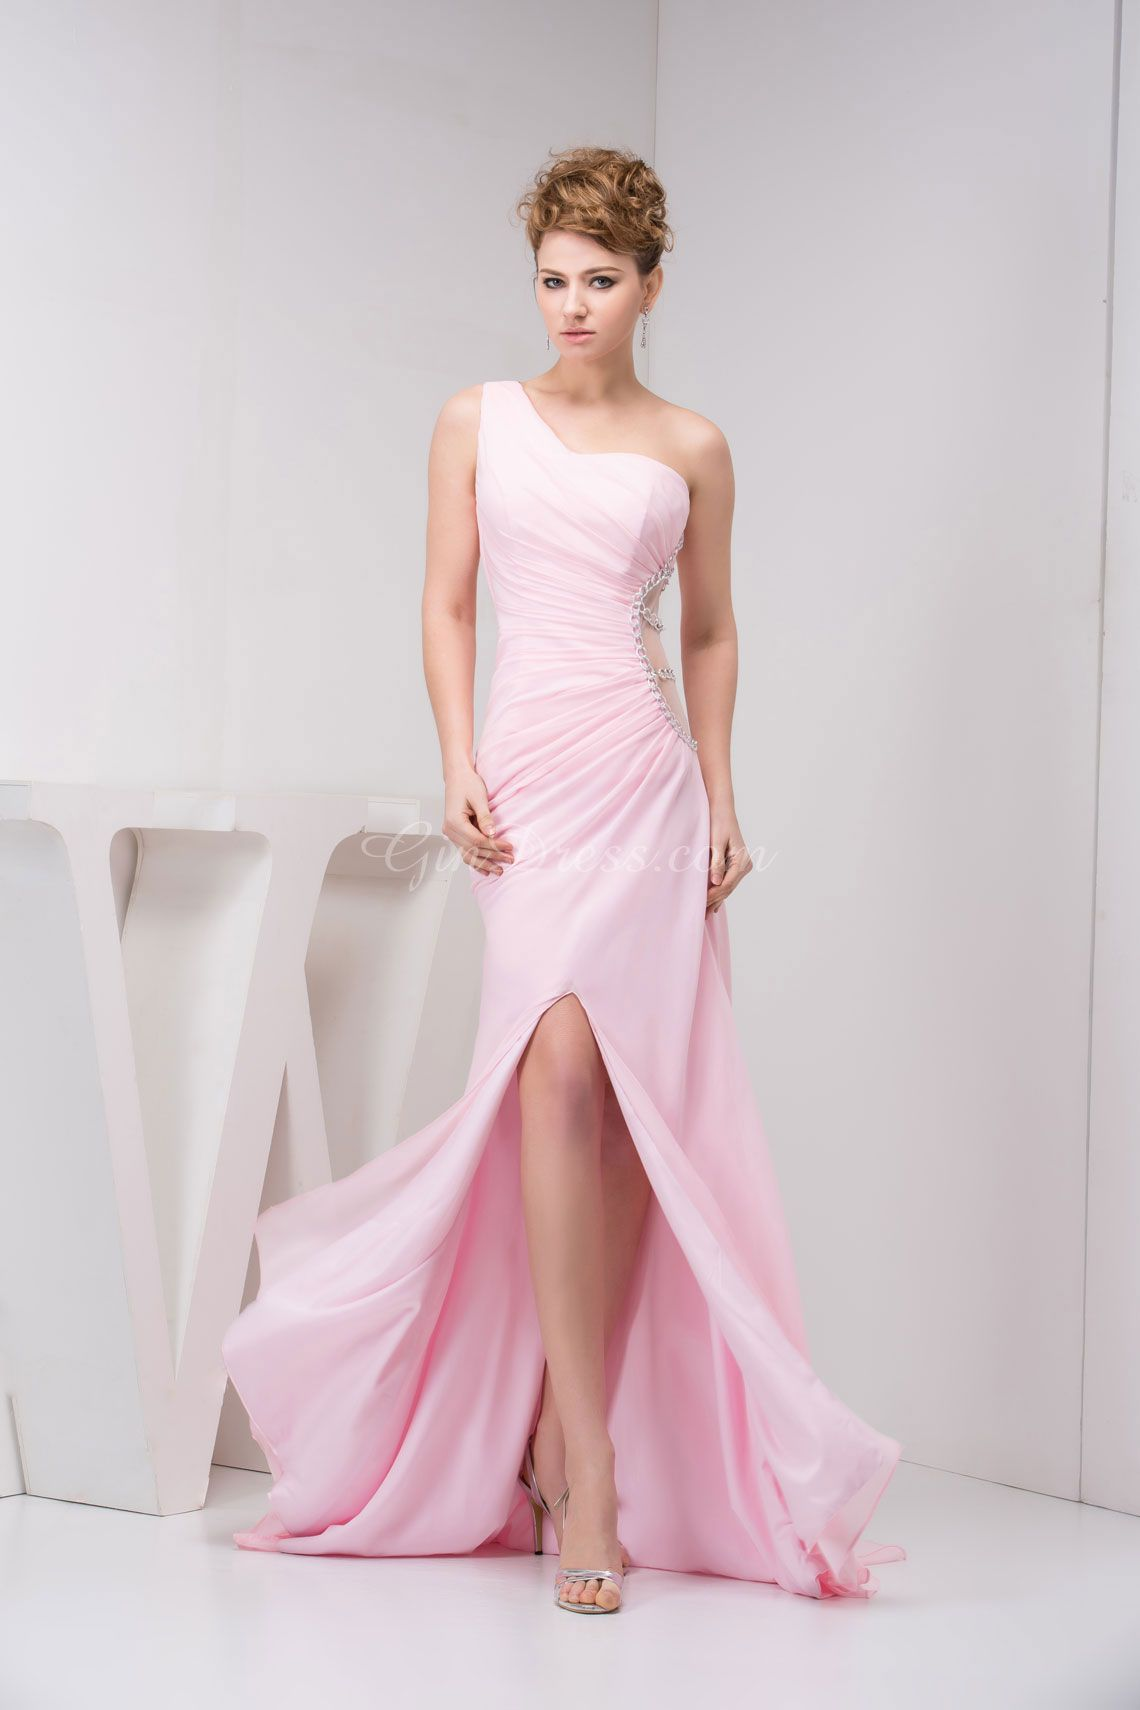 prom dress prom dresses | My dream pets | Pinterest